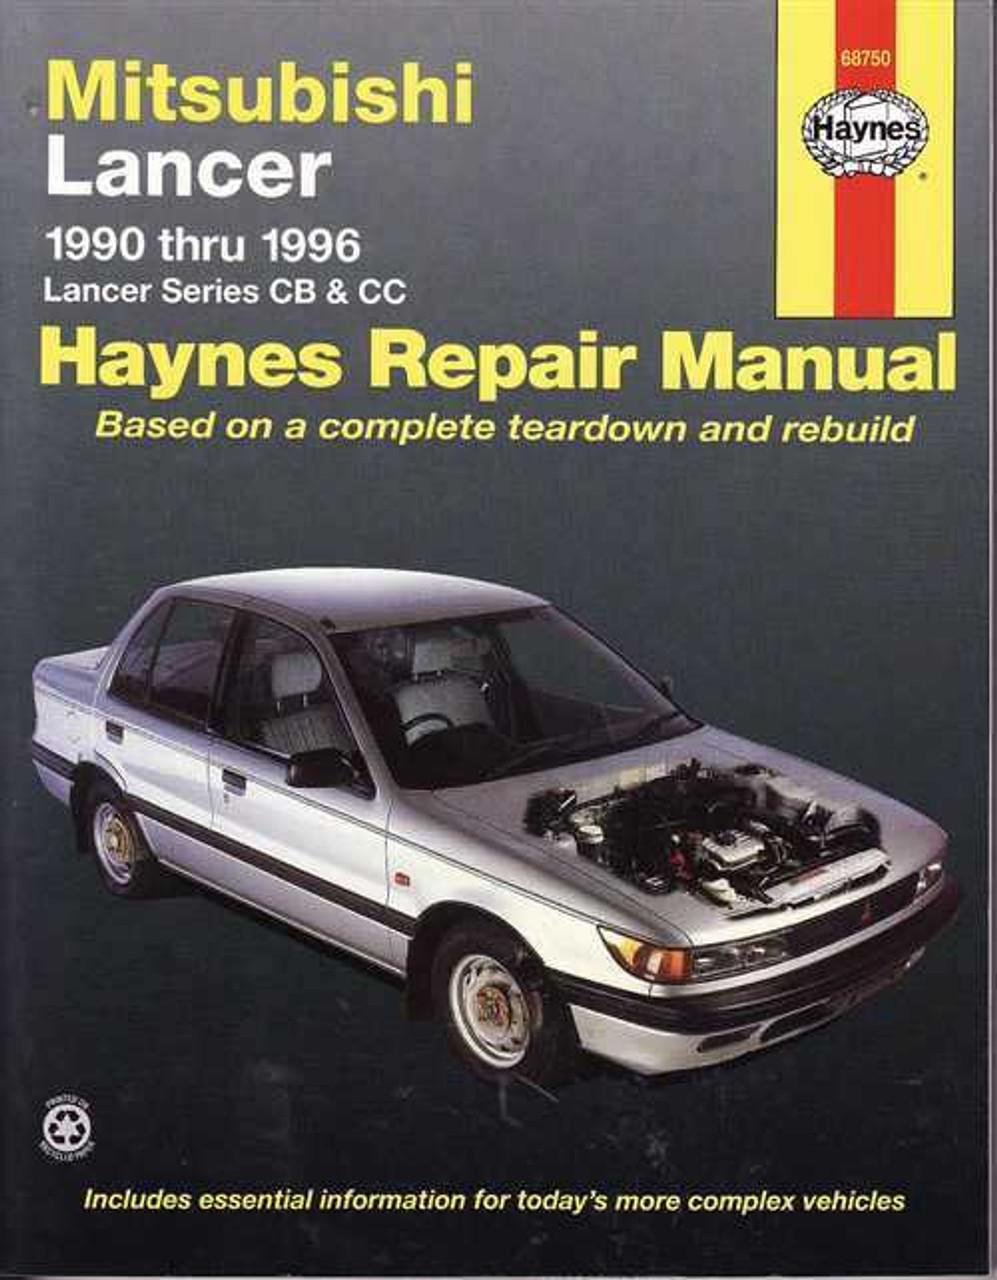 mitsubishi lancer cb amp cc 1990 1996 workshop manual rh automotobookshop com au Clymer Manuals Mygmlink Owner's Manual